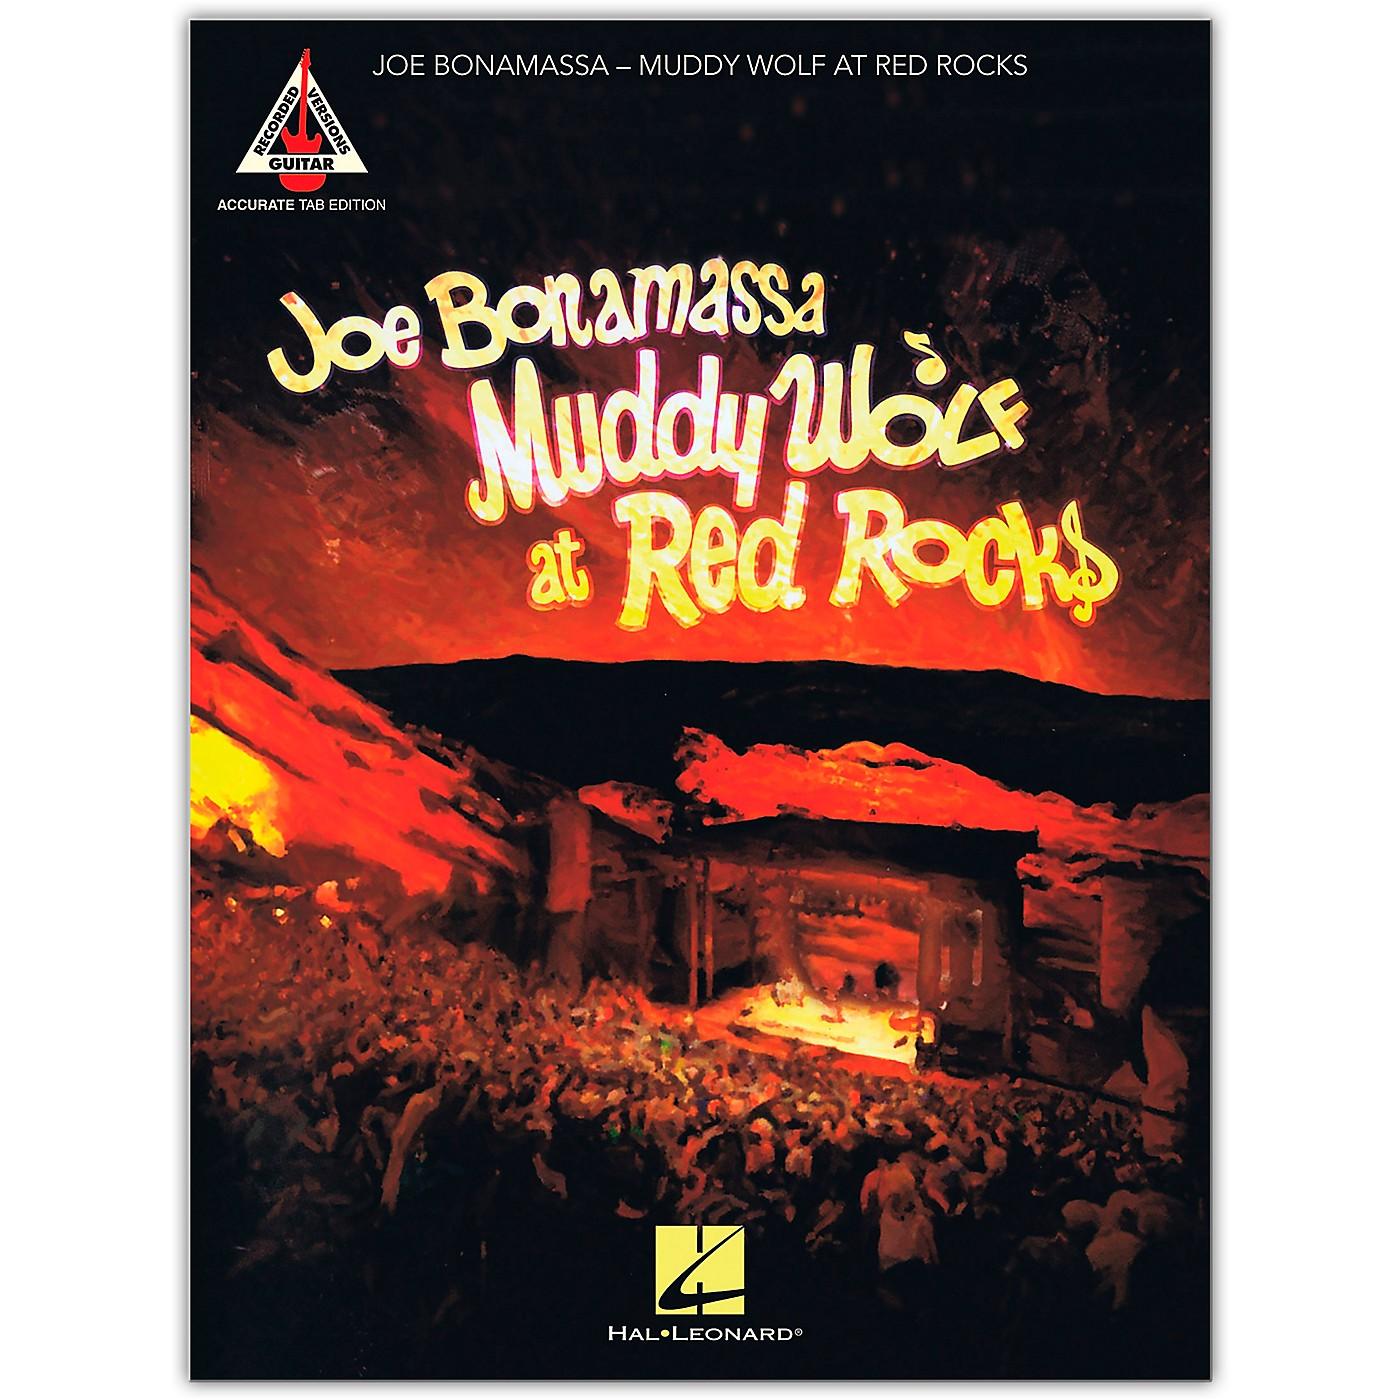 Hal Leonard Joe Bonamassa - Muddy Wolf at Red Rocks Tab Guitar Songbook thumbnail